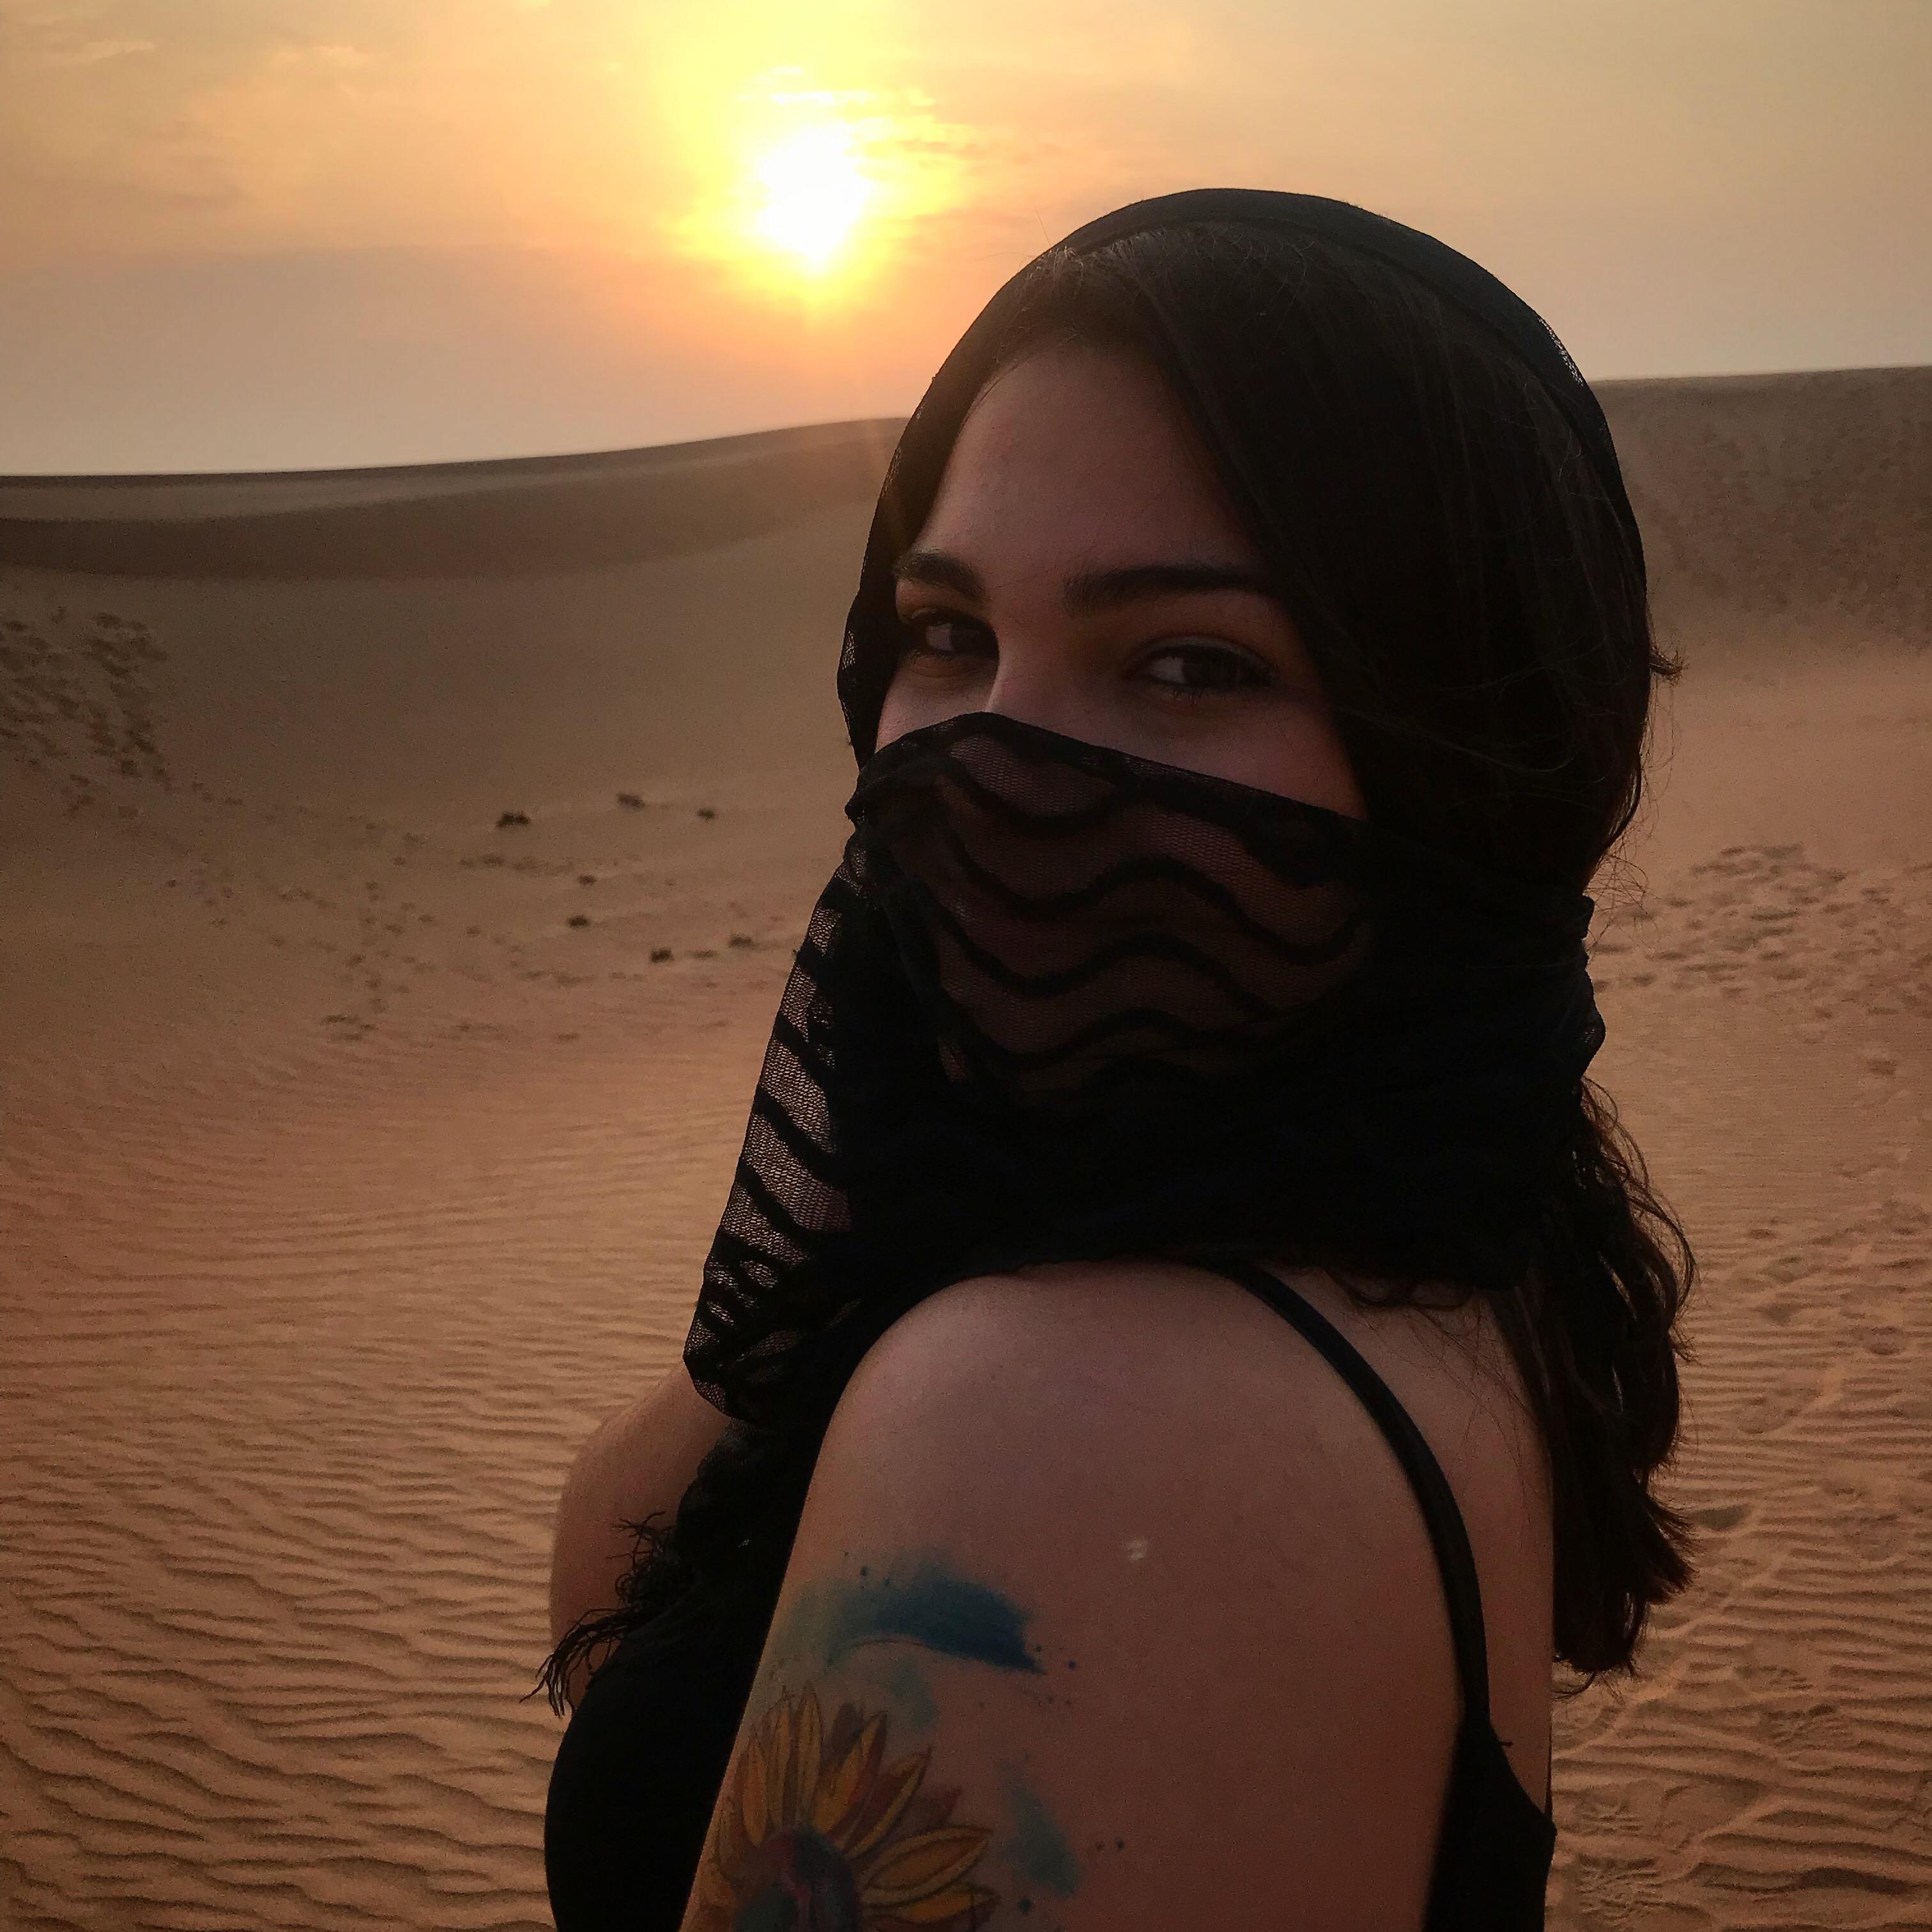 No deserto de Dubai